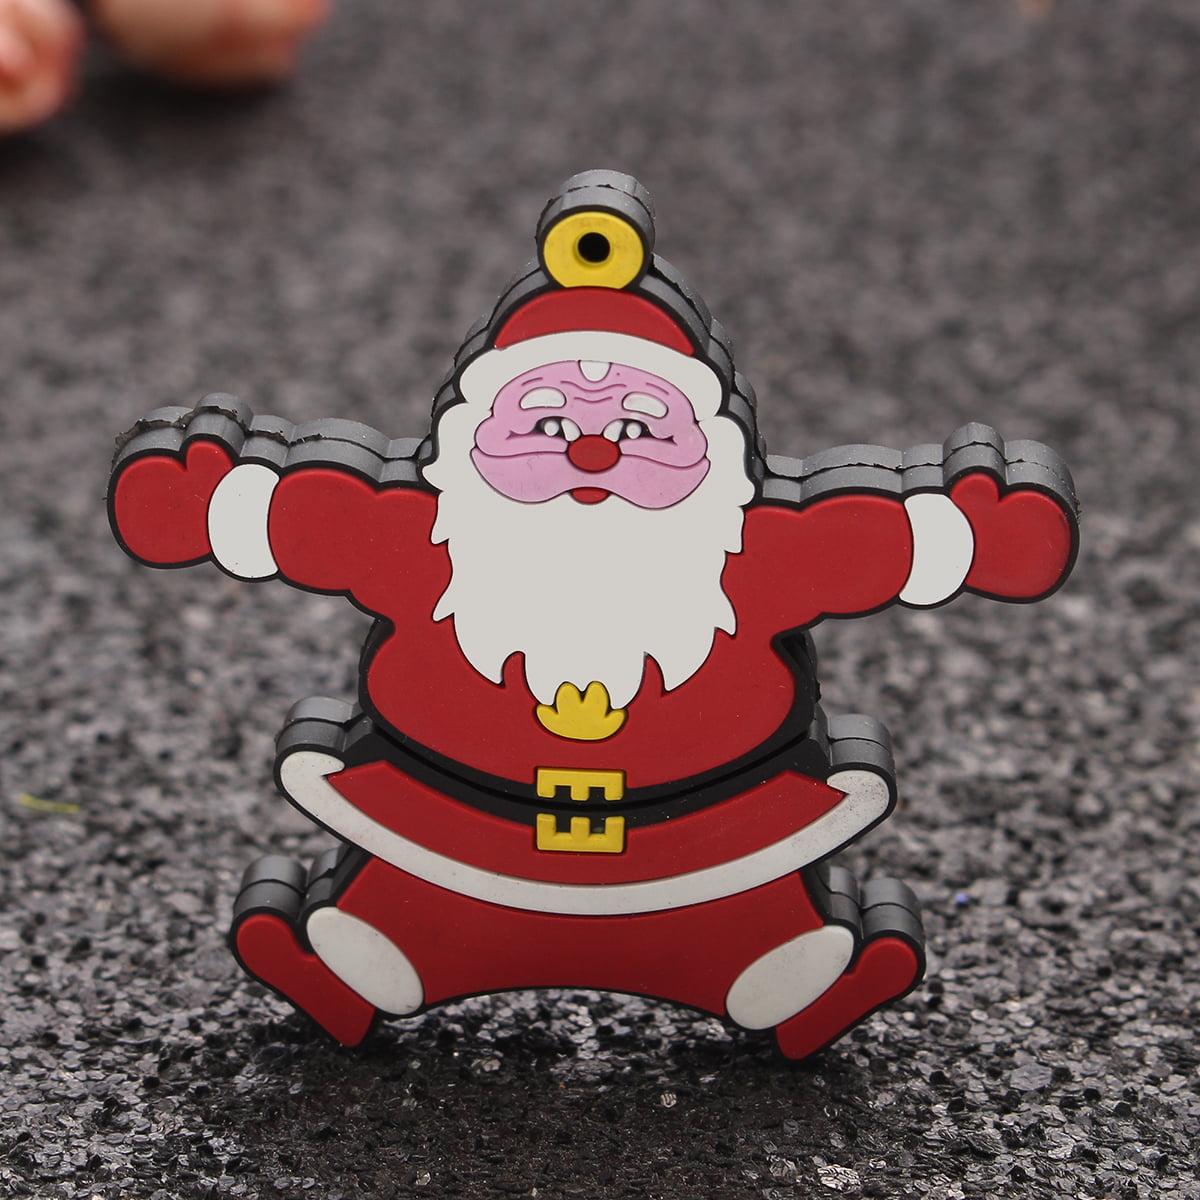 Lot 10/20/50 usb 1GB Santa Claus USB2.0 Flash Drive Memory Stick Christmas Gifts